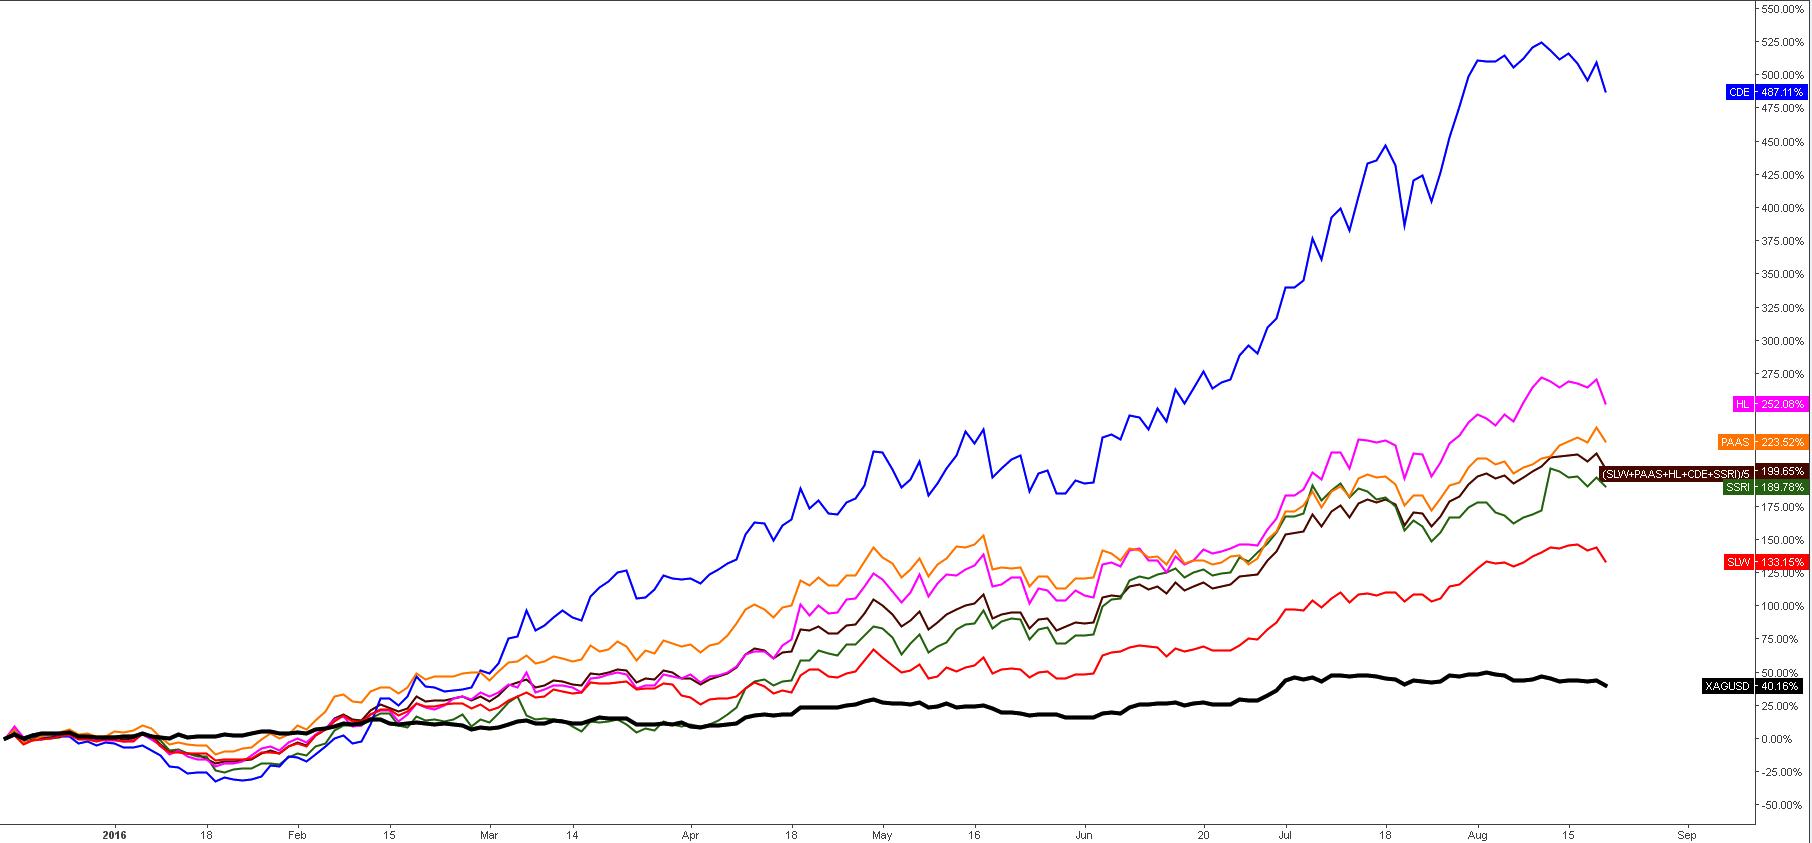 Top Silver Stocks Vs. Silver